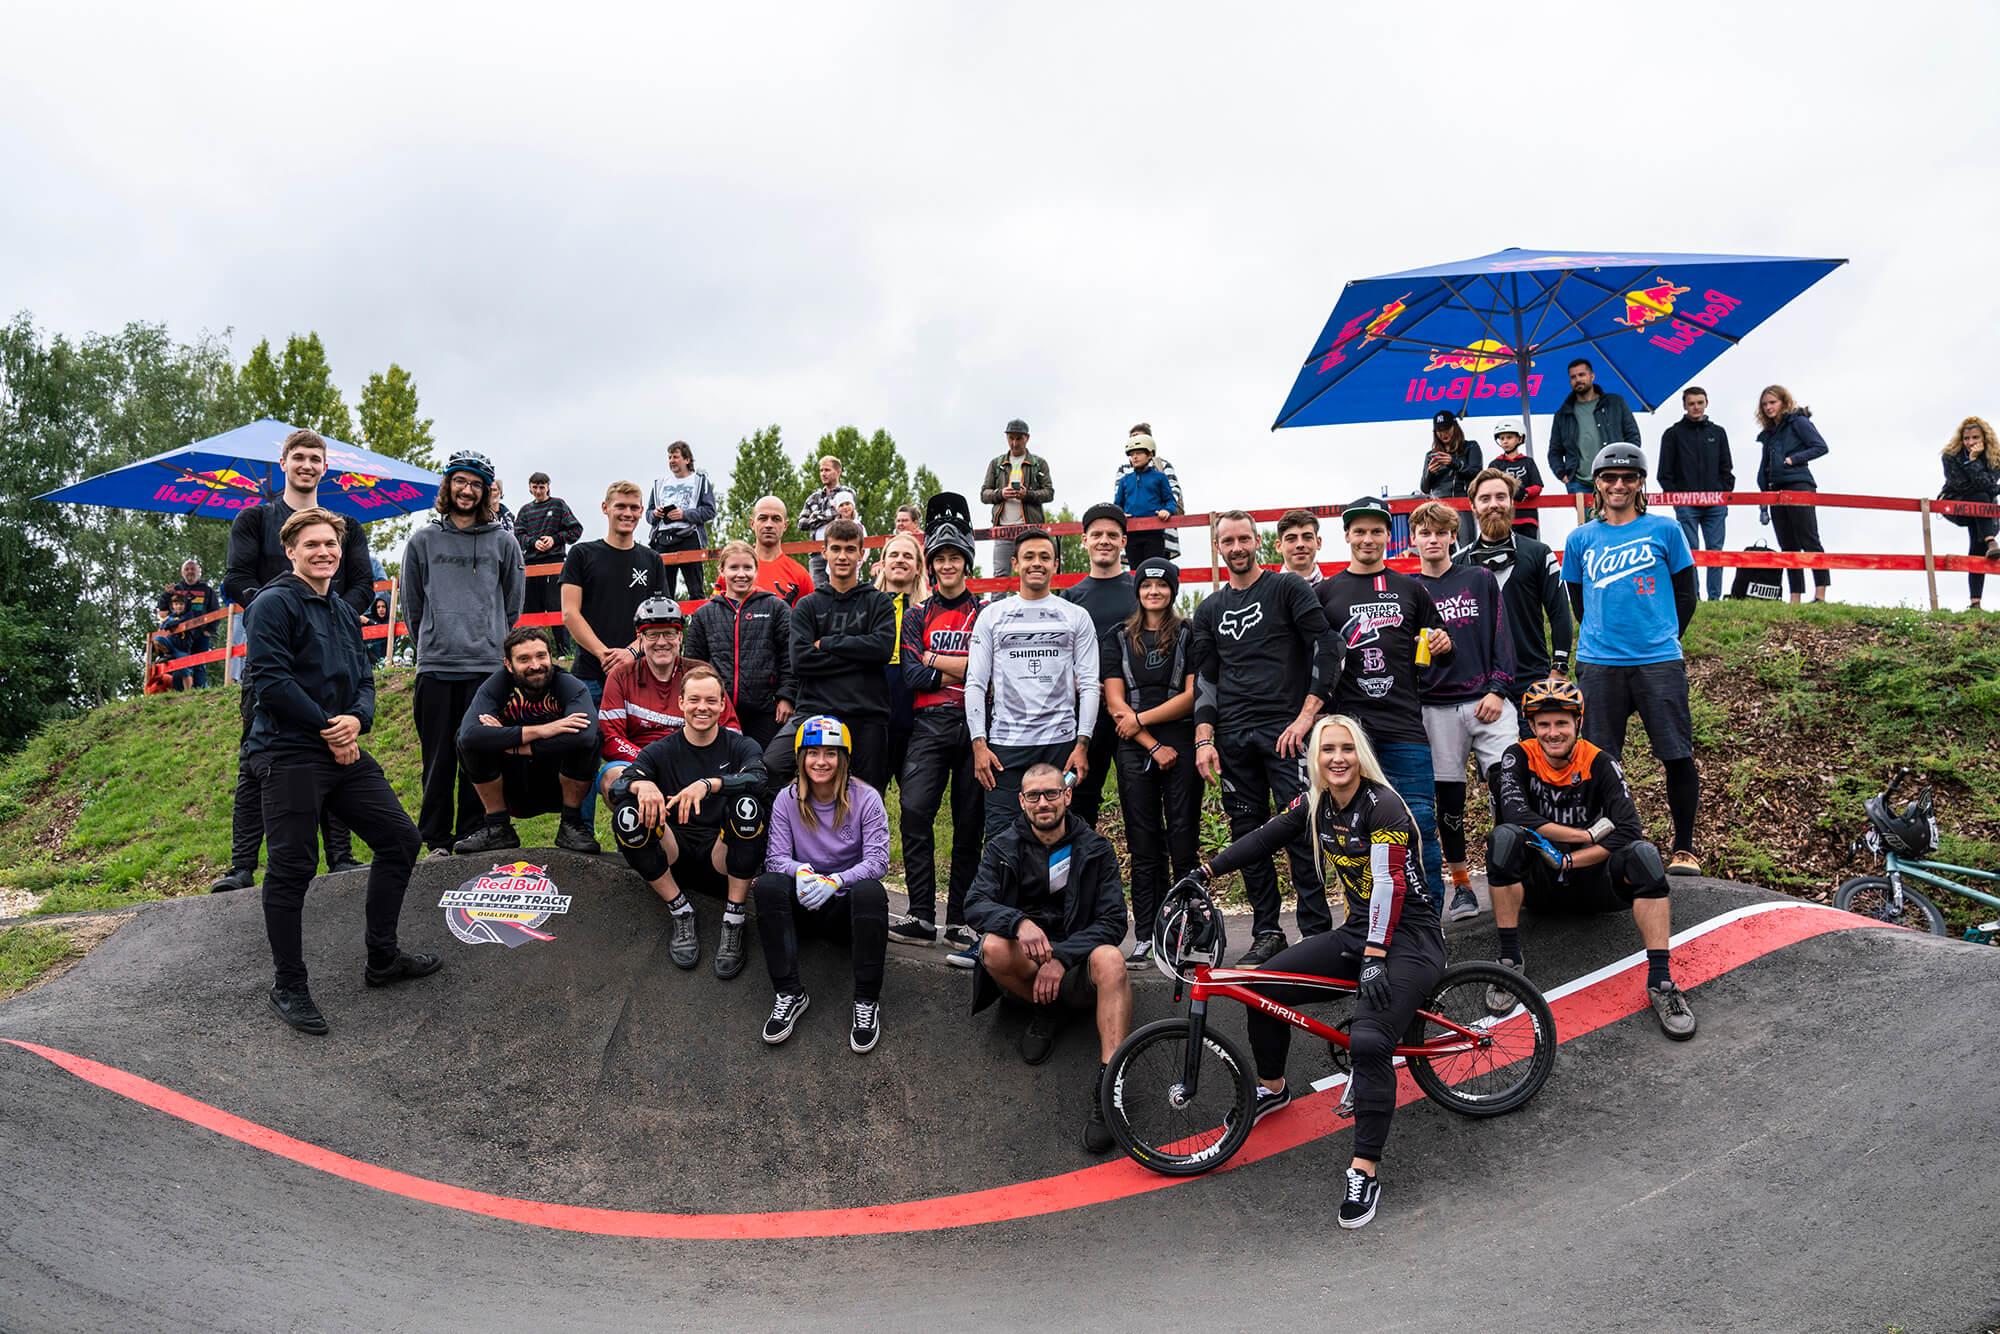 Red Bull Pump Track Qualifier Mellowpark Aug 2021 - Thomas Dietze -95